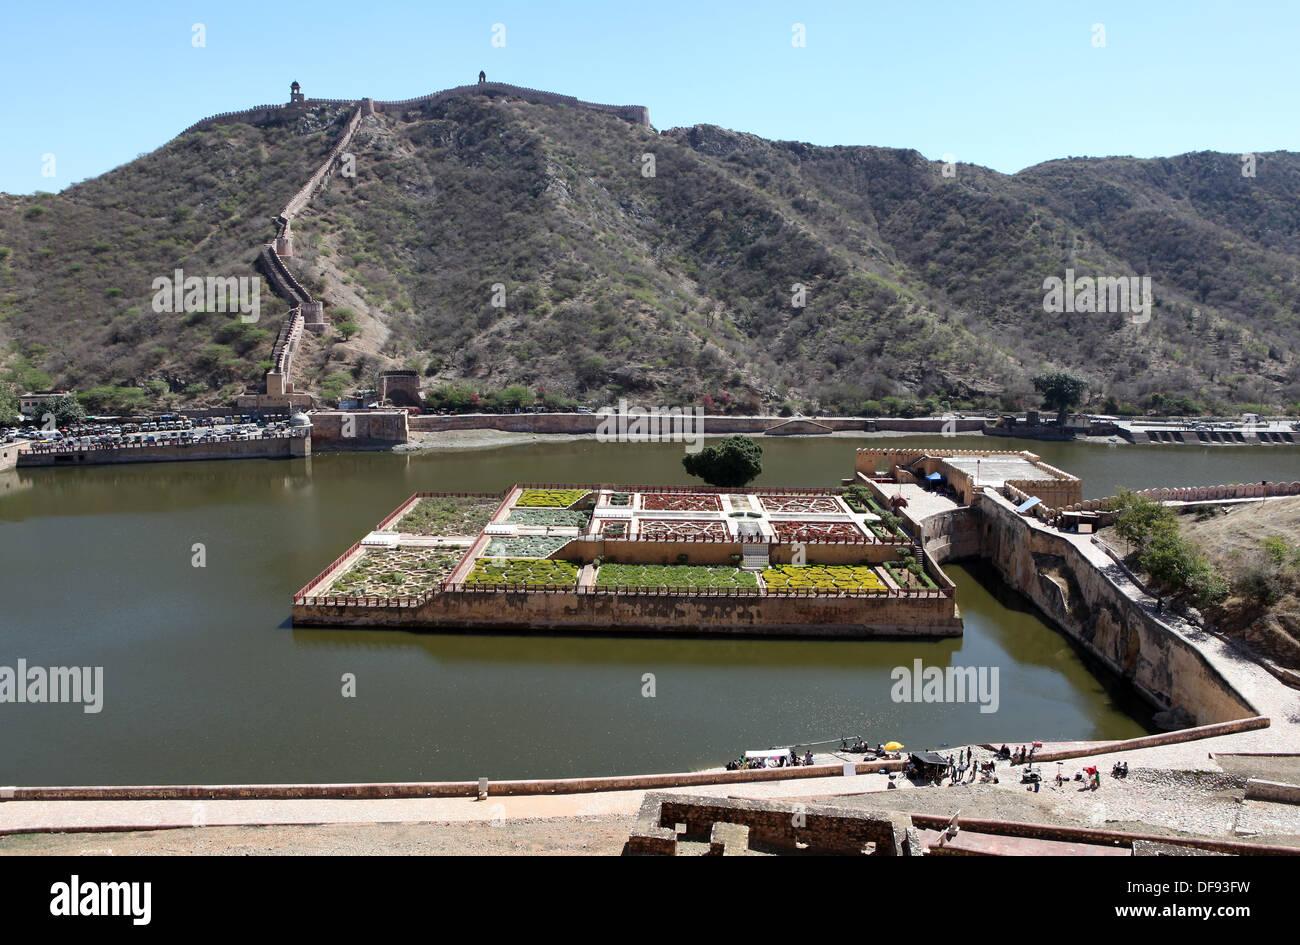 Kesar Kyari Bagh gardens, Fort Amber near Jaipur, Rajasthan, India,Asia. - Stock Image